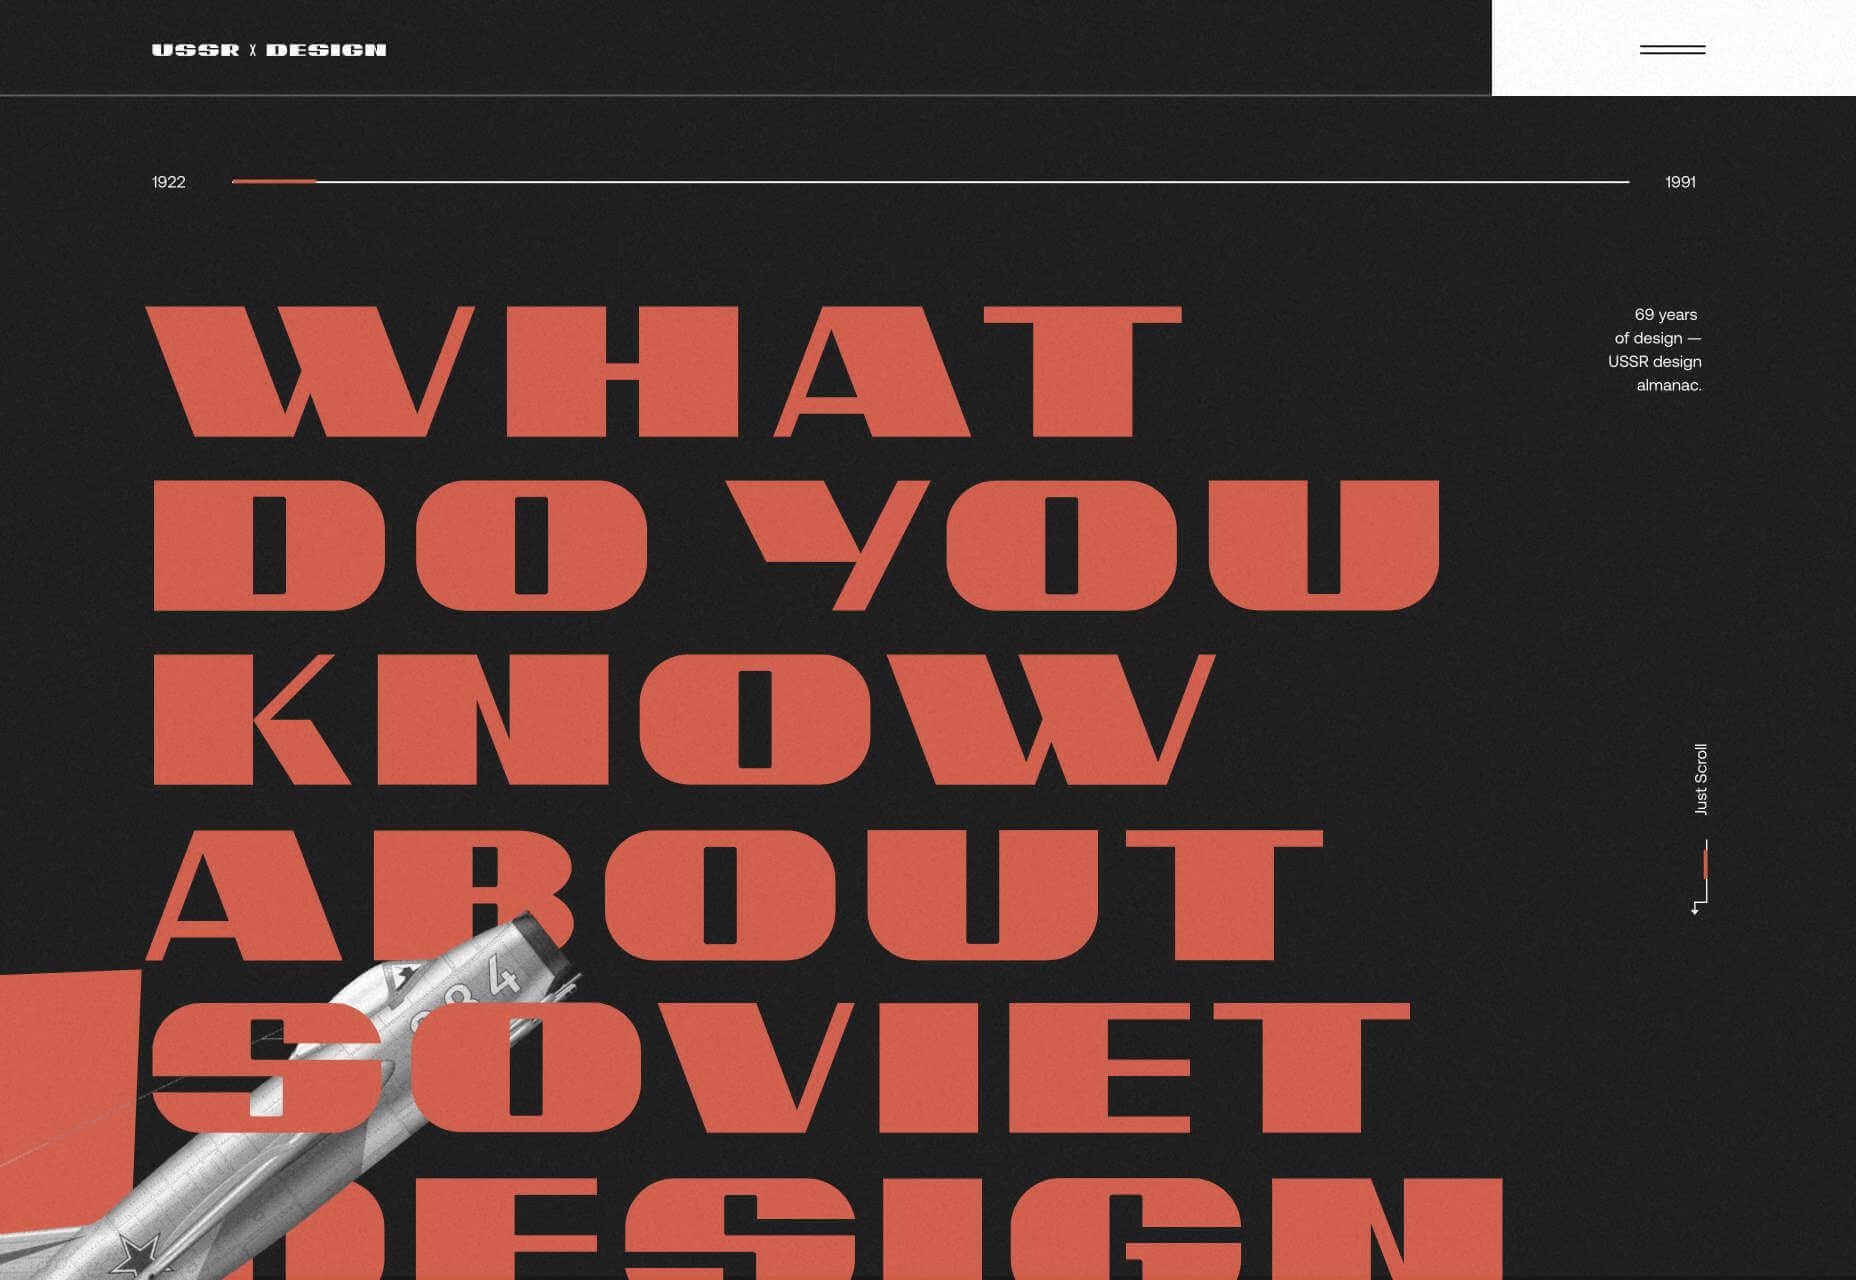 ussr-design-almanac